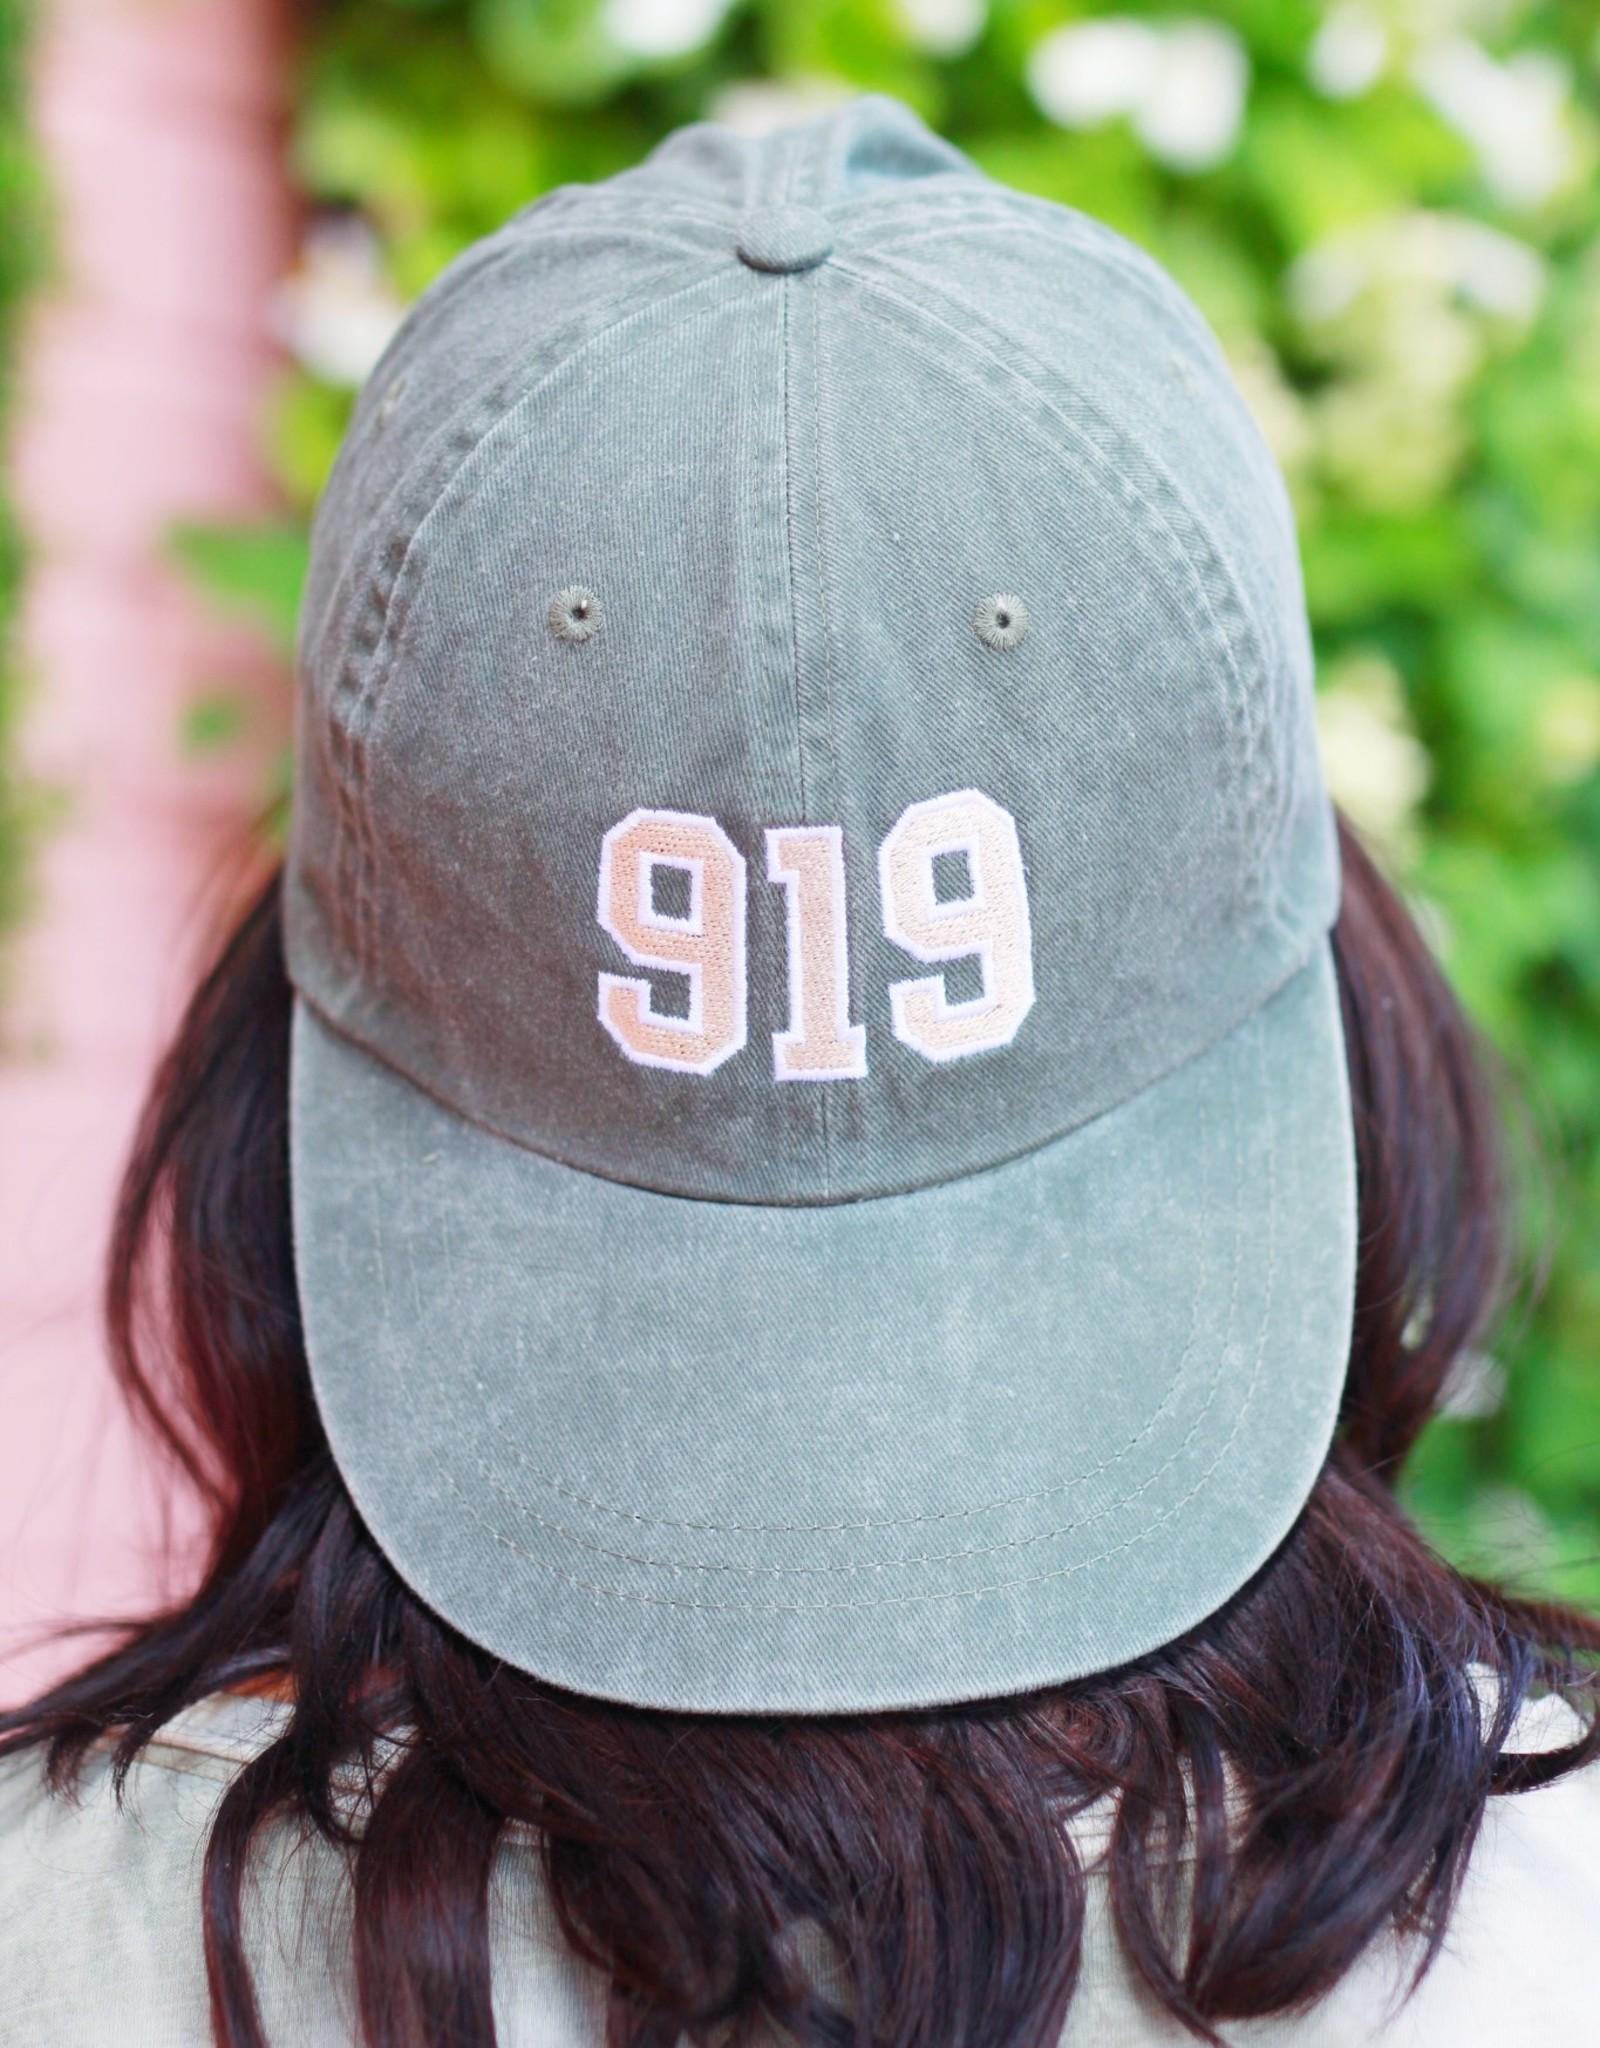 Local Squirrel Originals 919 Baseball Cap